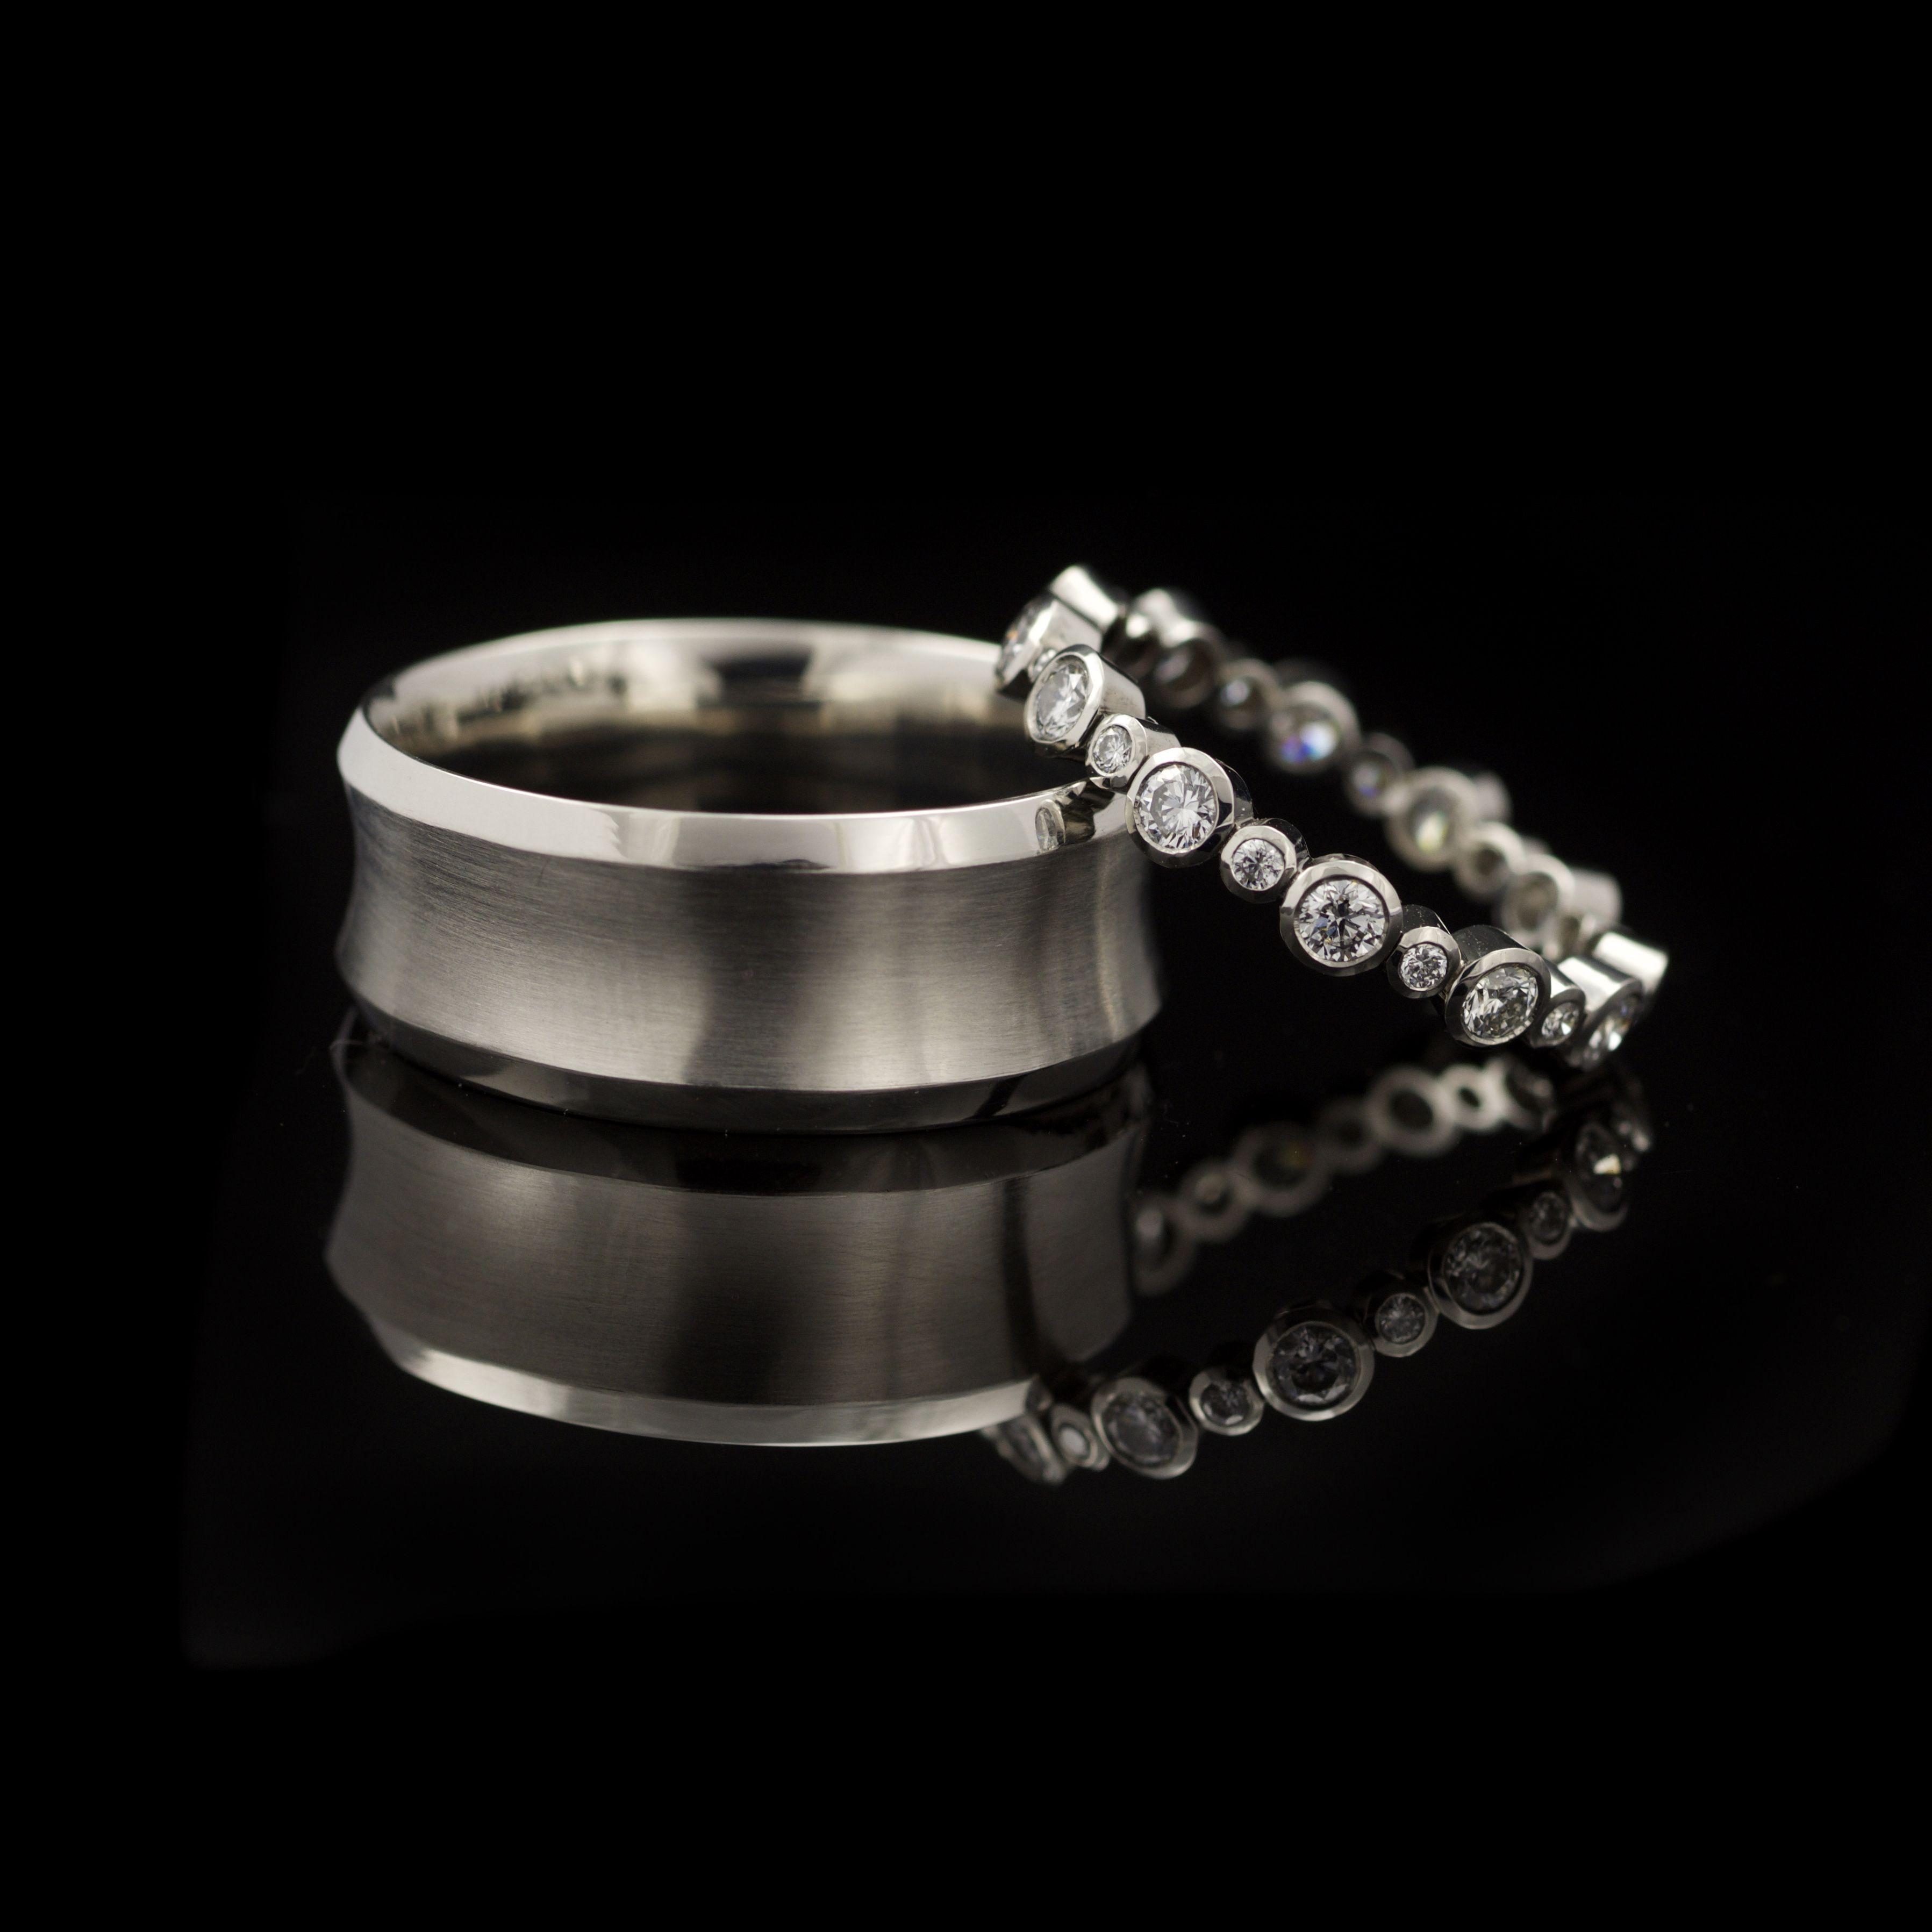 Bespoke wedding ring set in platinum concave wide band